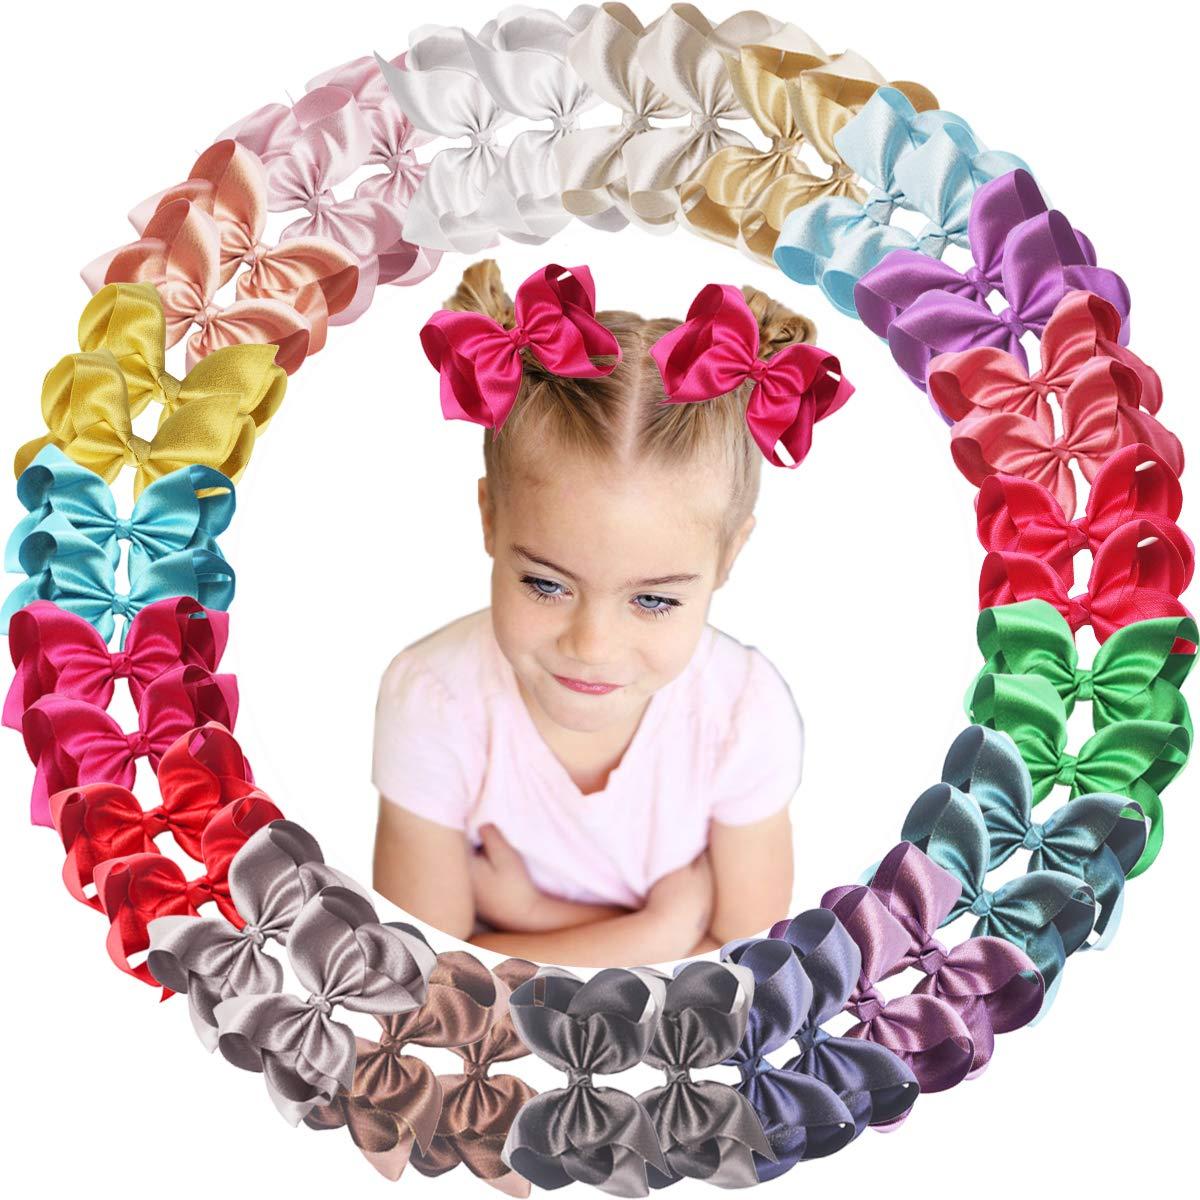 40PCS Baby Girls Glitter Grosgrain Bows Clips Ribbon 4.5Inc Phoenix Mall Direct store Hair